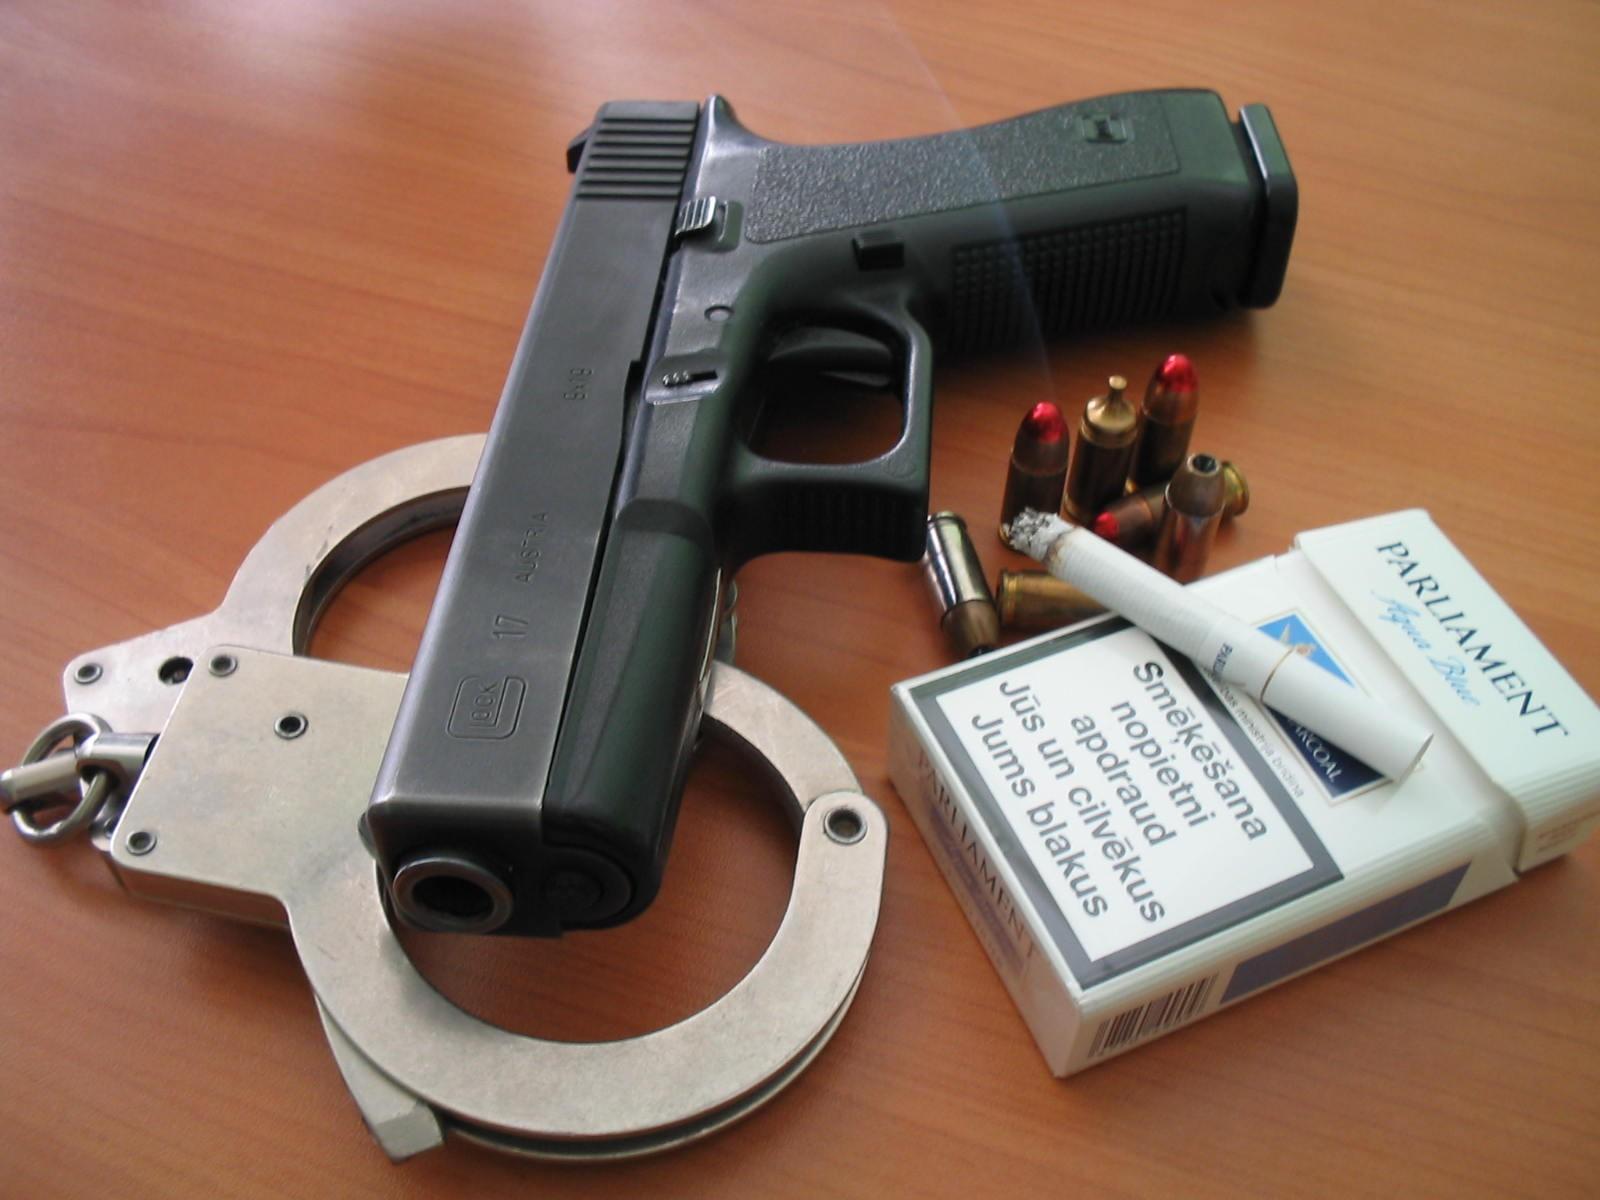 Glock Wallpaper Hd صور مسدسات 2 Hd منتديات درر العراق